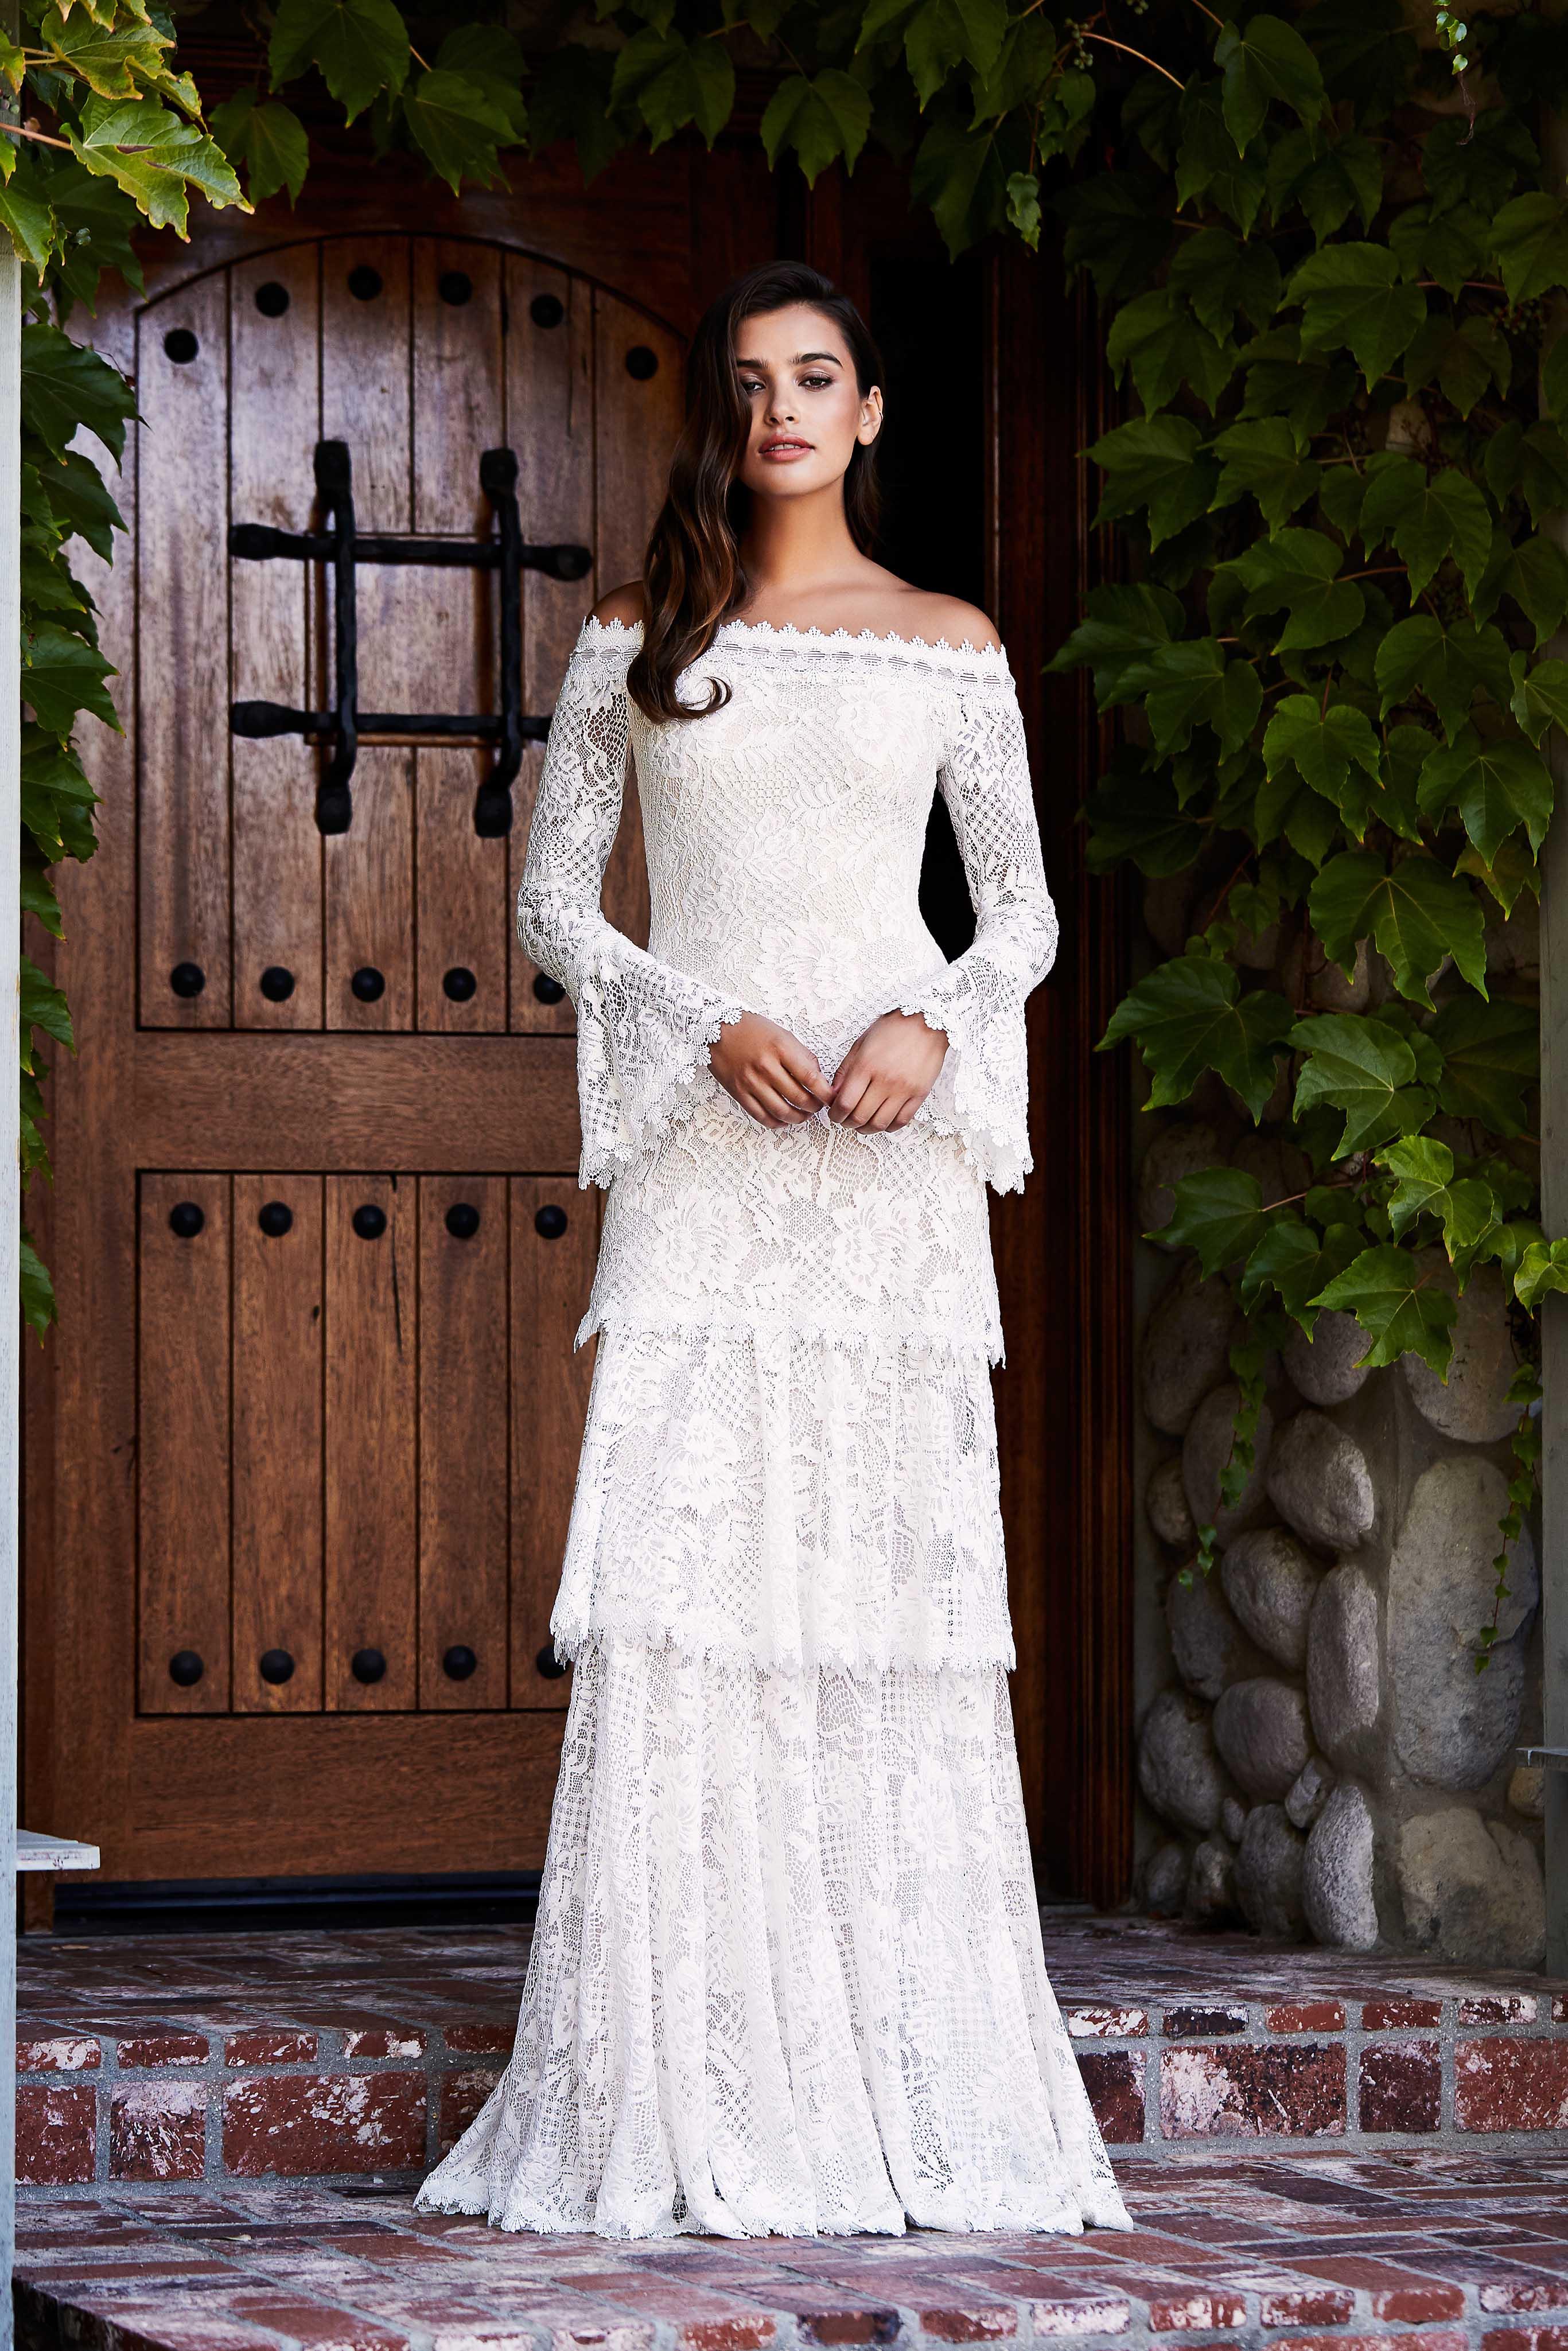 tadashi shoji wedding dress fall 2018 tiered lace off the shoulder